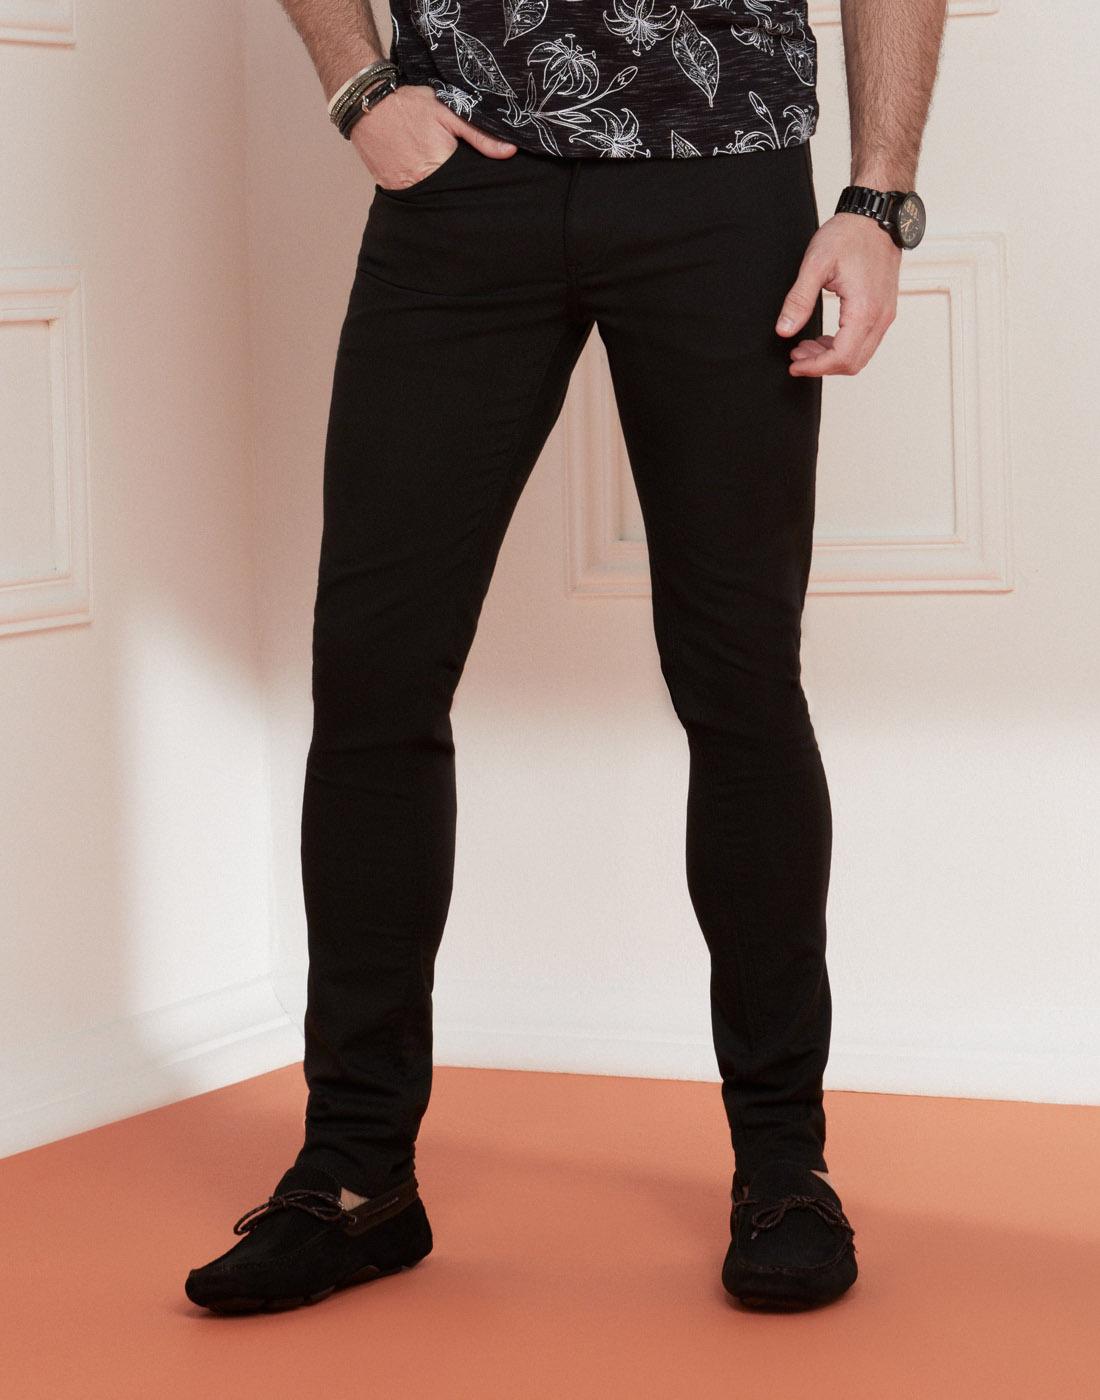 Calça Masc. Jeans Amaciado Skinny Preto Six One